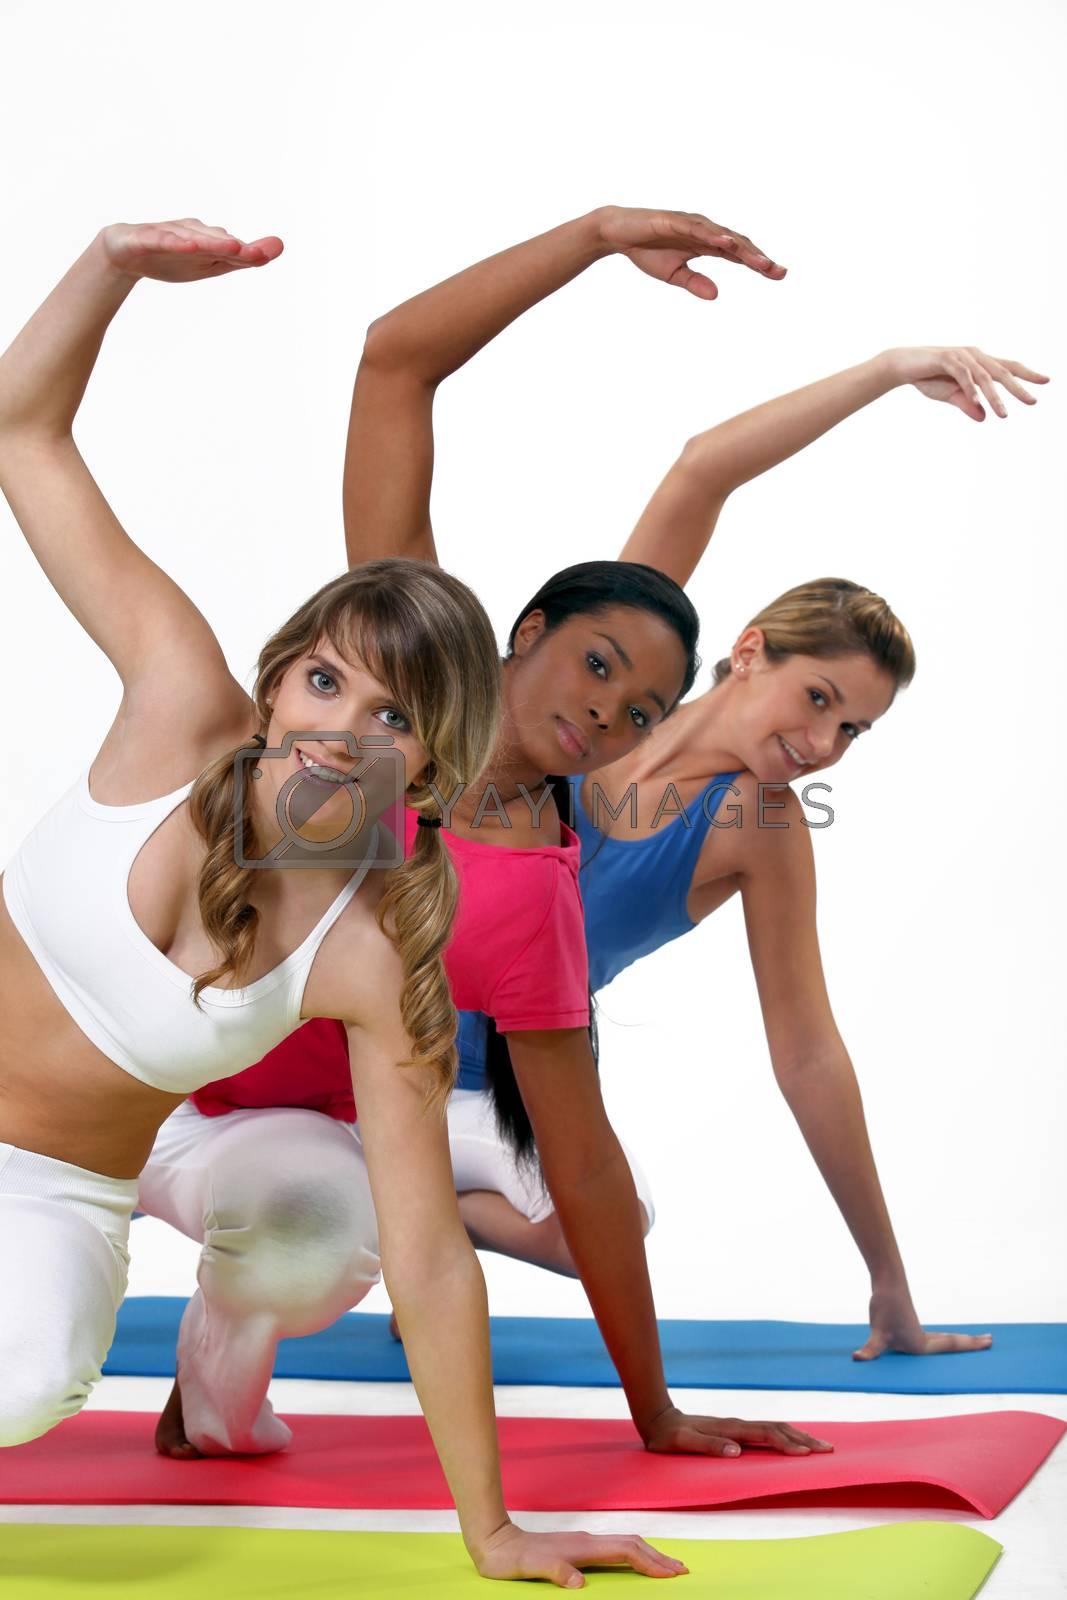 Three women in gym class